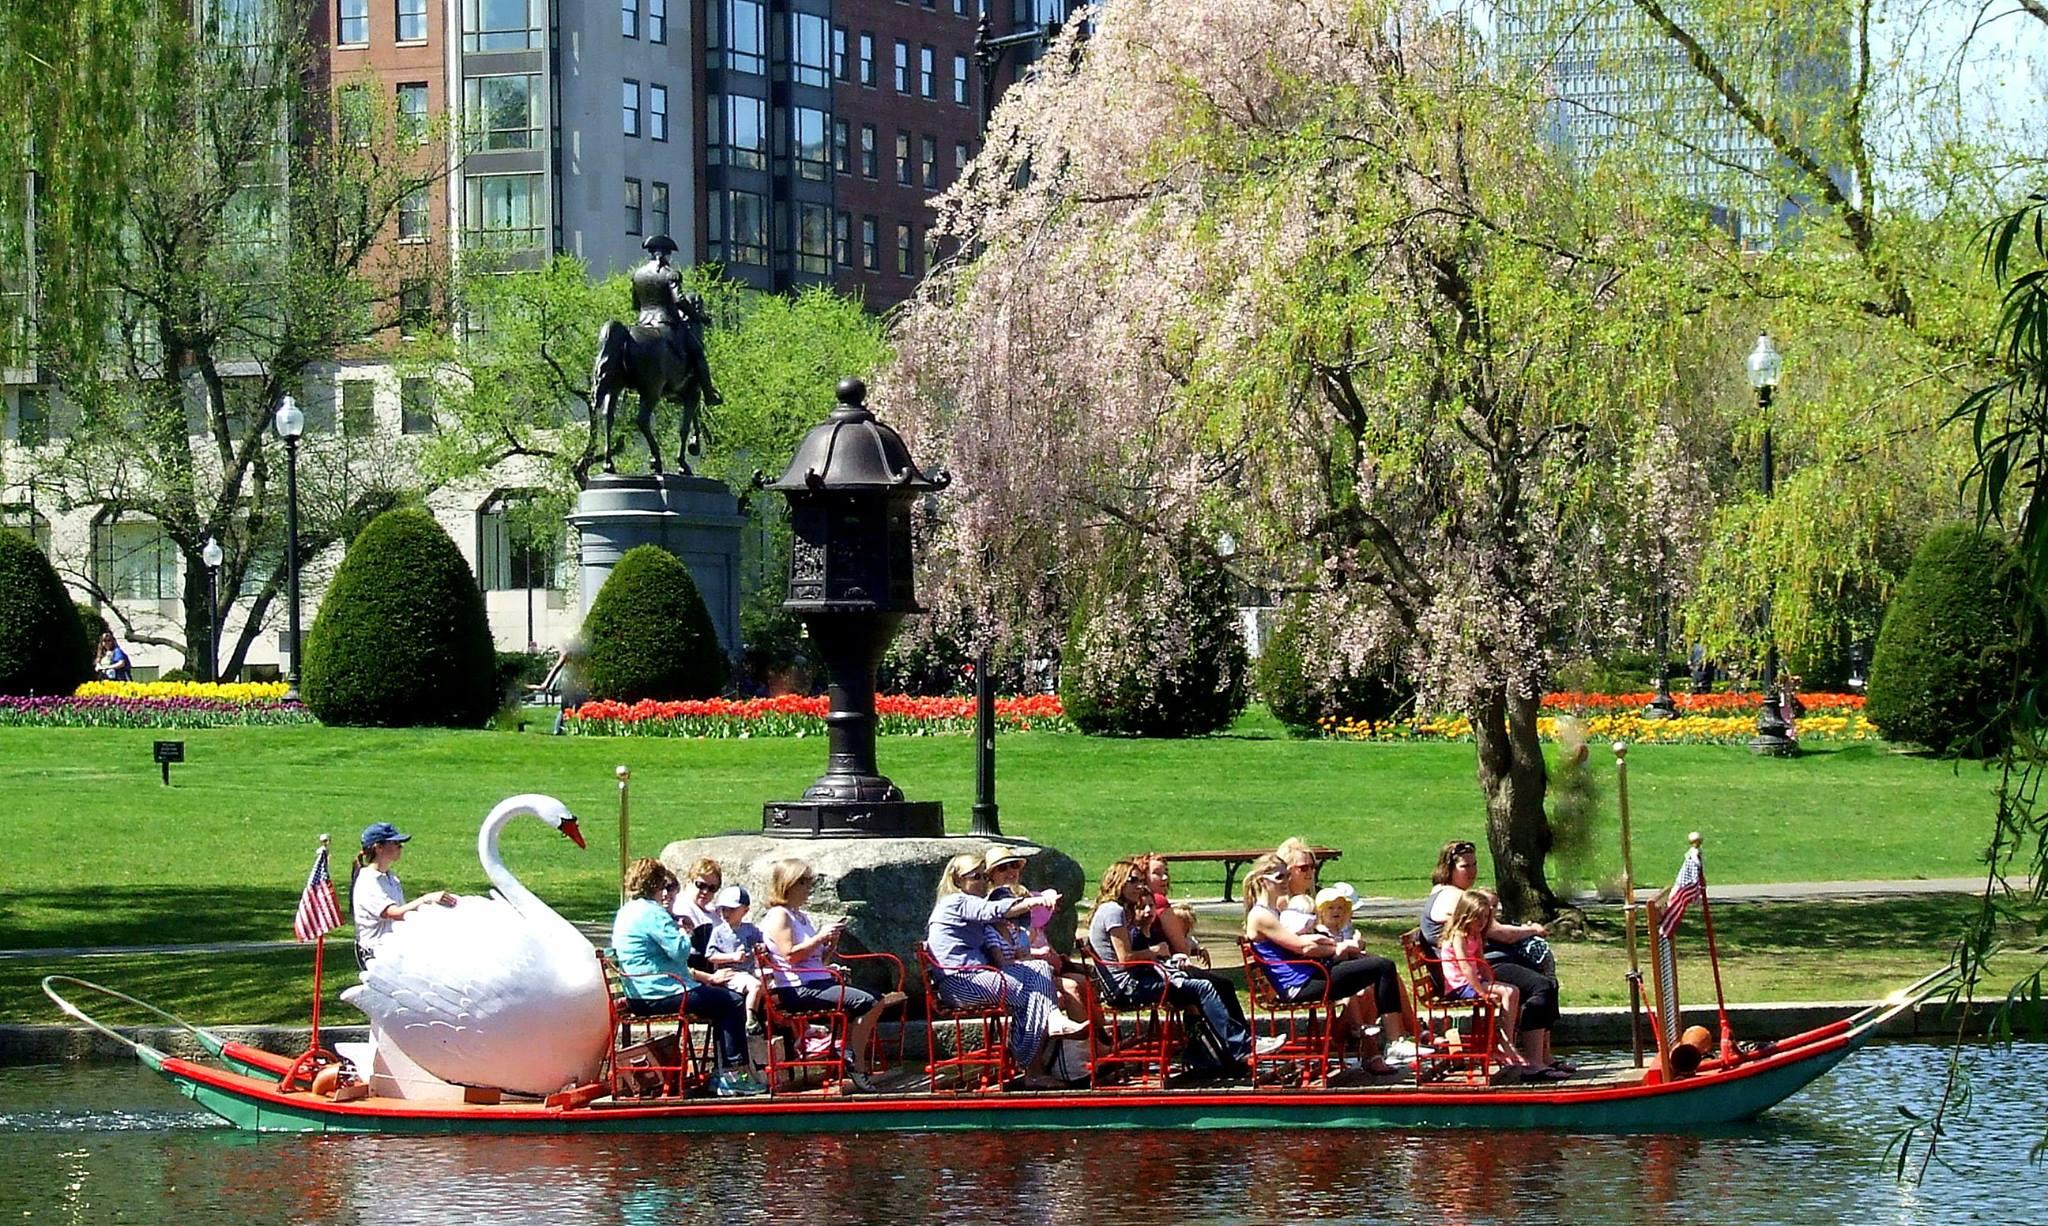 6/Boston Common & Public Garden